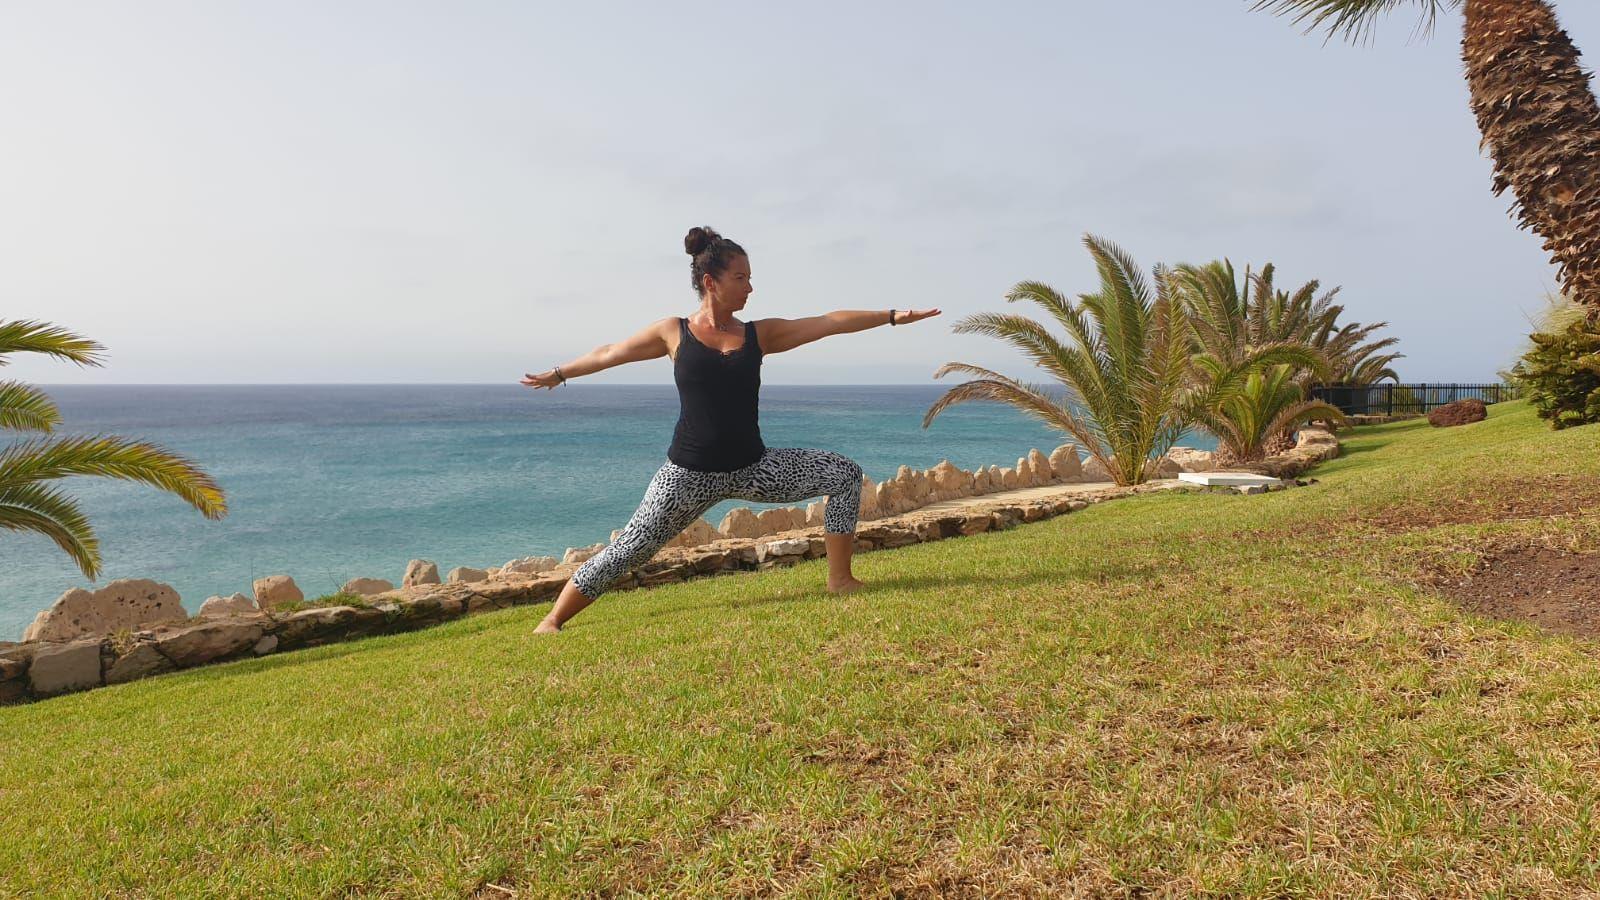 Yoga Urlaube/Retreats - YOGA Urlaube/Retreats